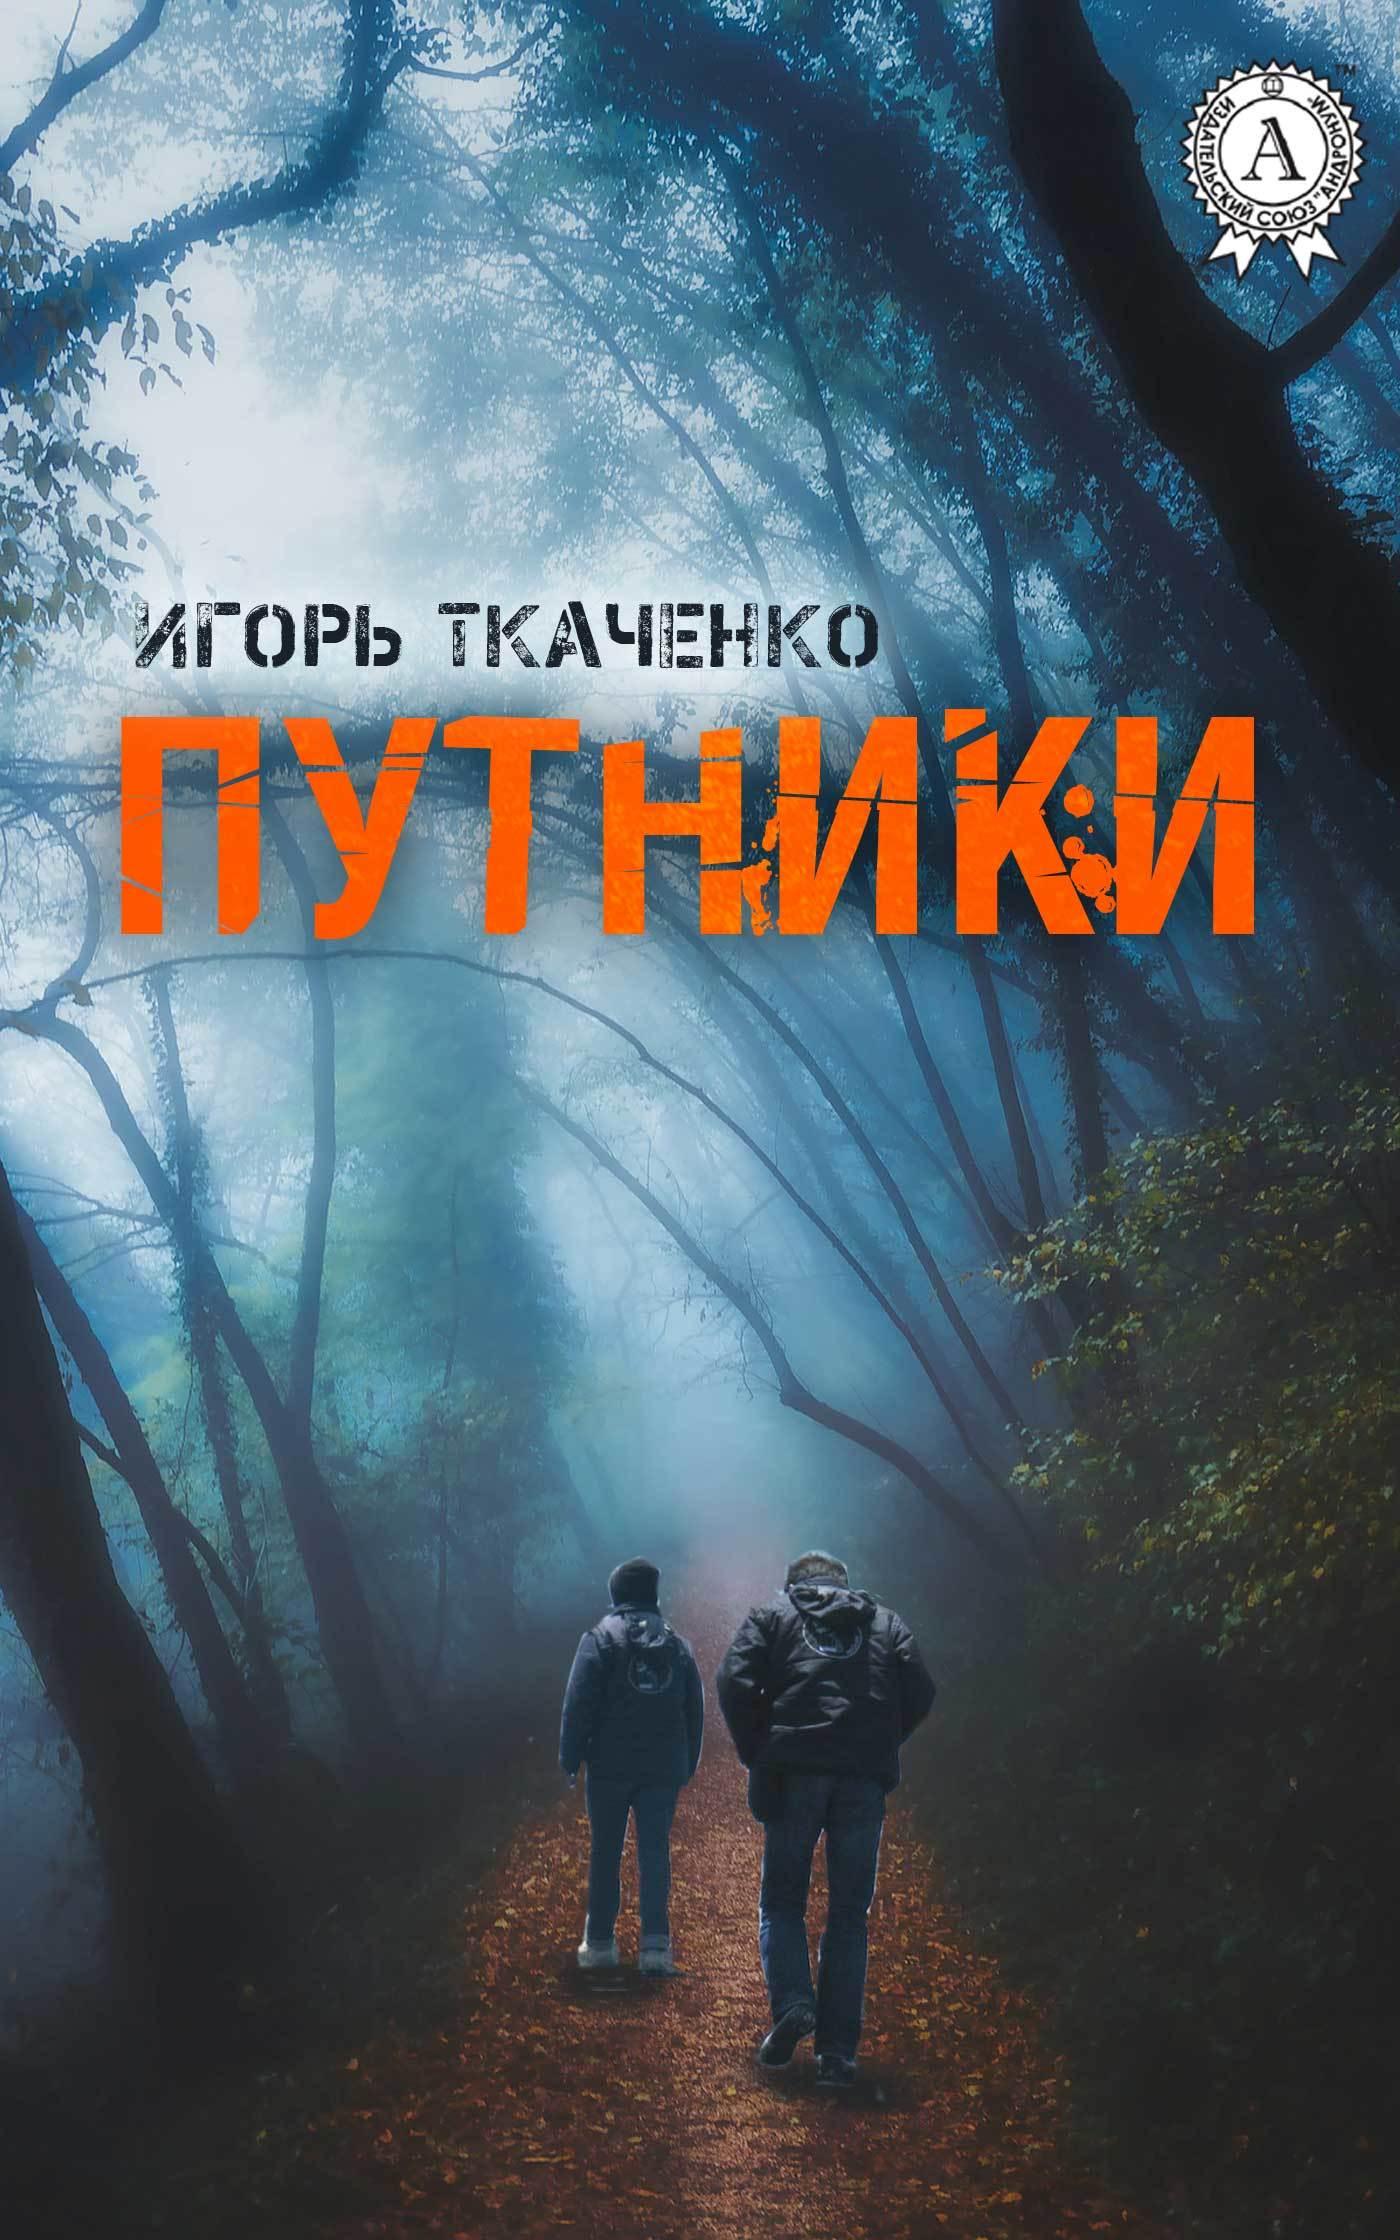 Игорь Ткаченко - Путники